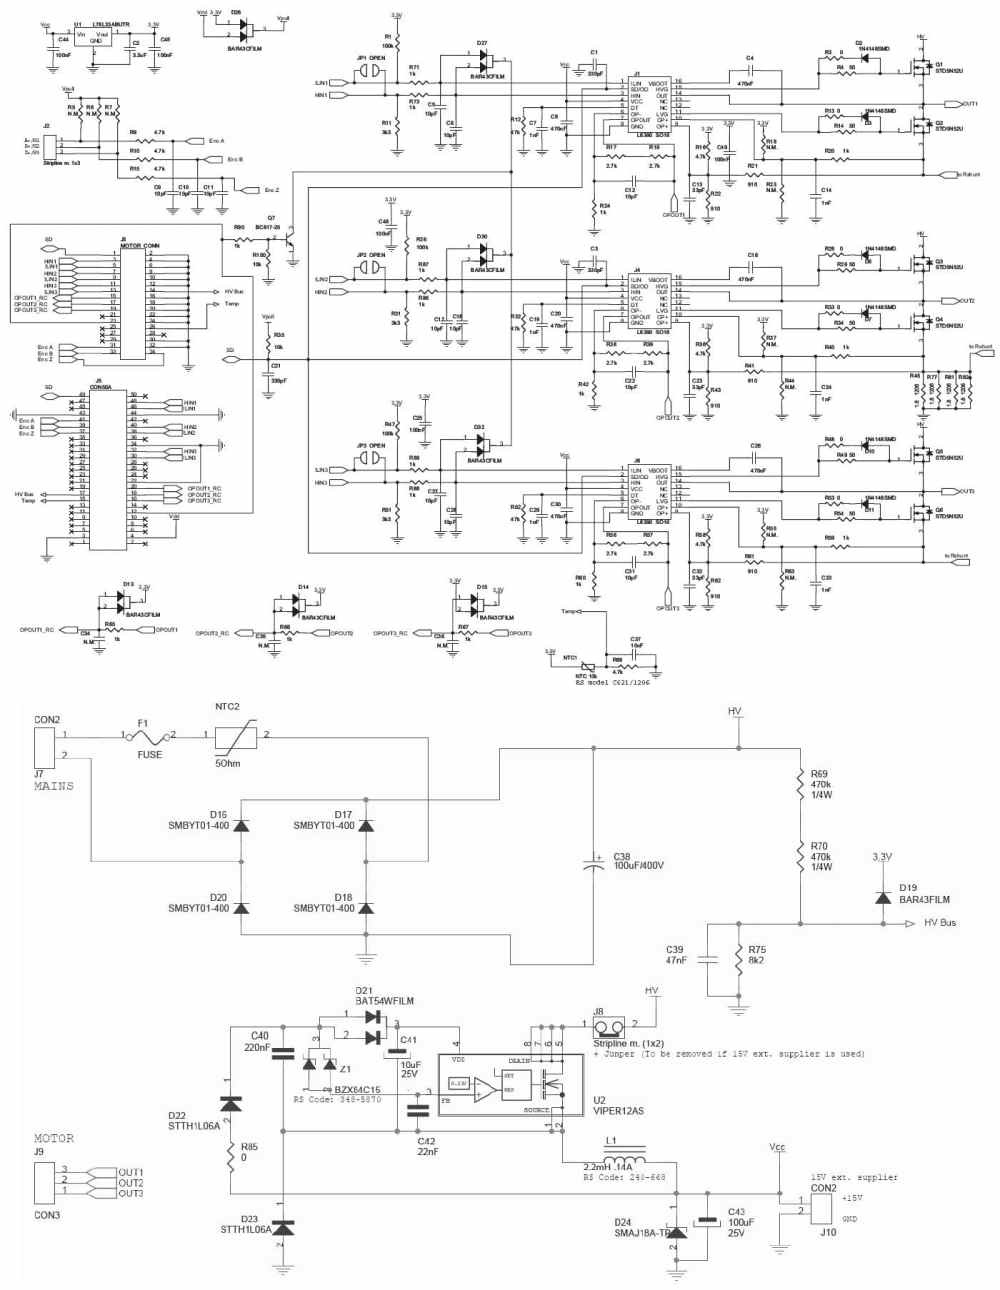 medium resolution of steval ihm021v2 100w pmsm motor driver 110 230v digikey 10 schematic diagram of variable frequency